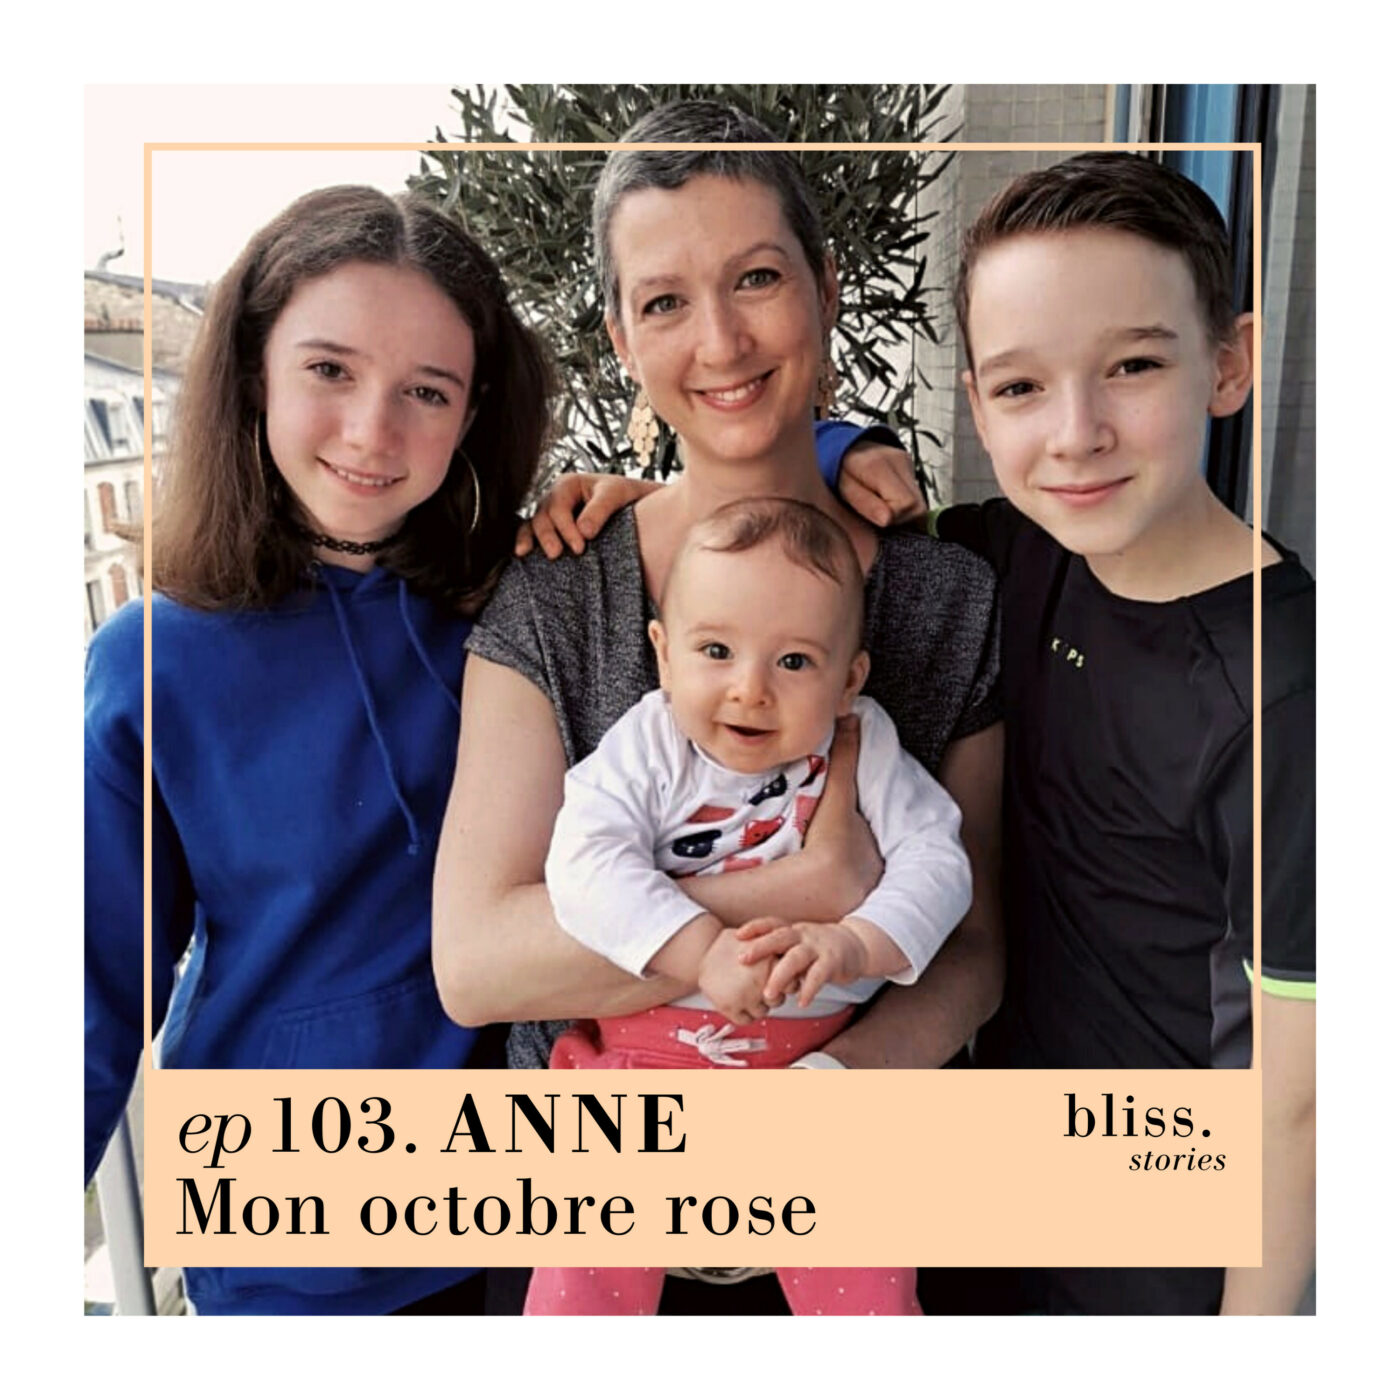 EP103- ANNE, MON OCTOBRE ROSE